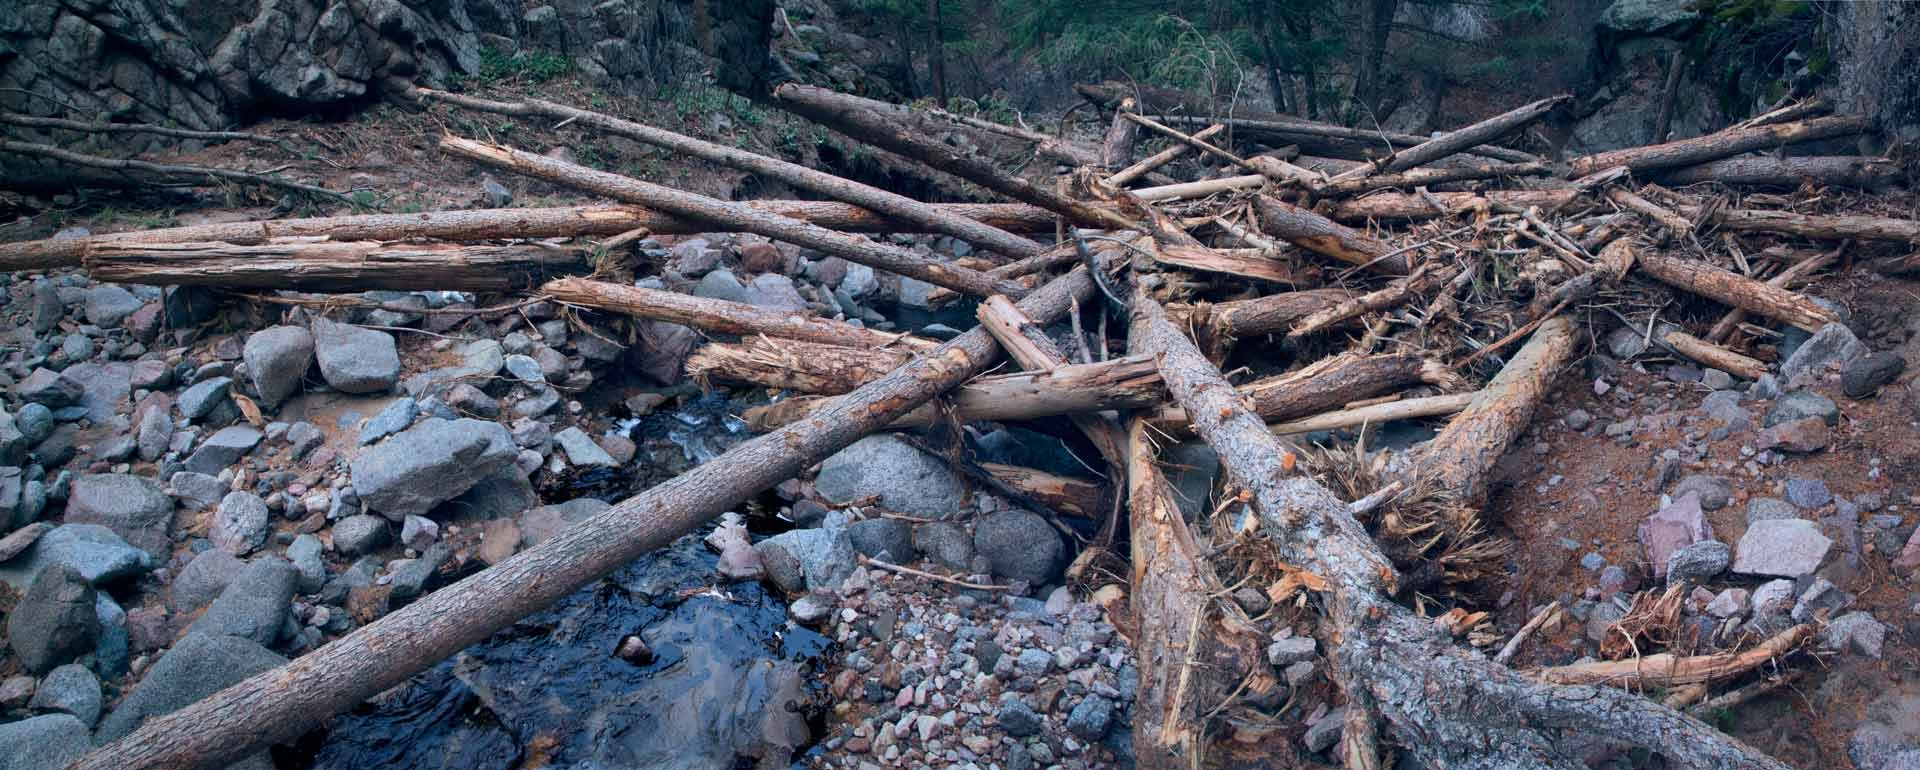 Habitat destruction essay